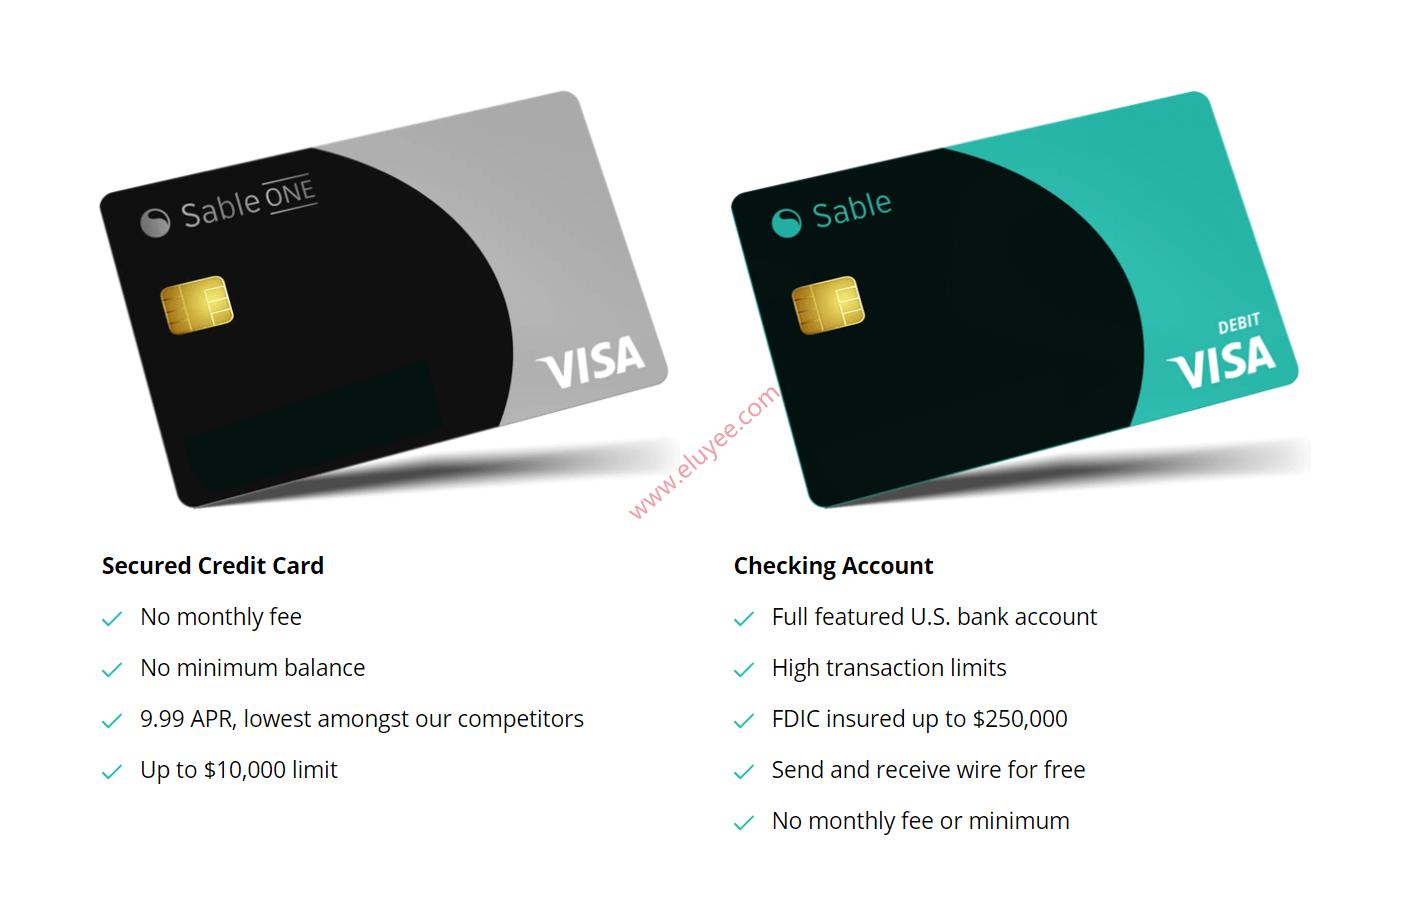 Sable美国移动美国,Checking账户和美国信用卡